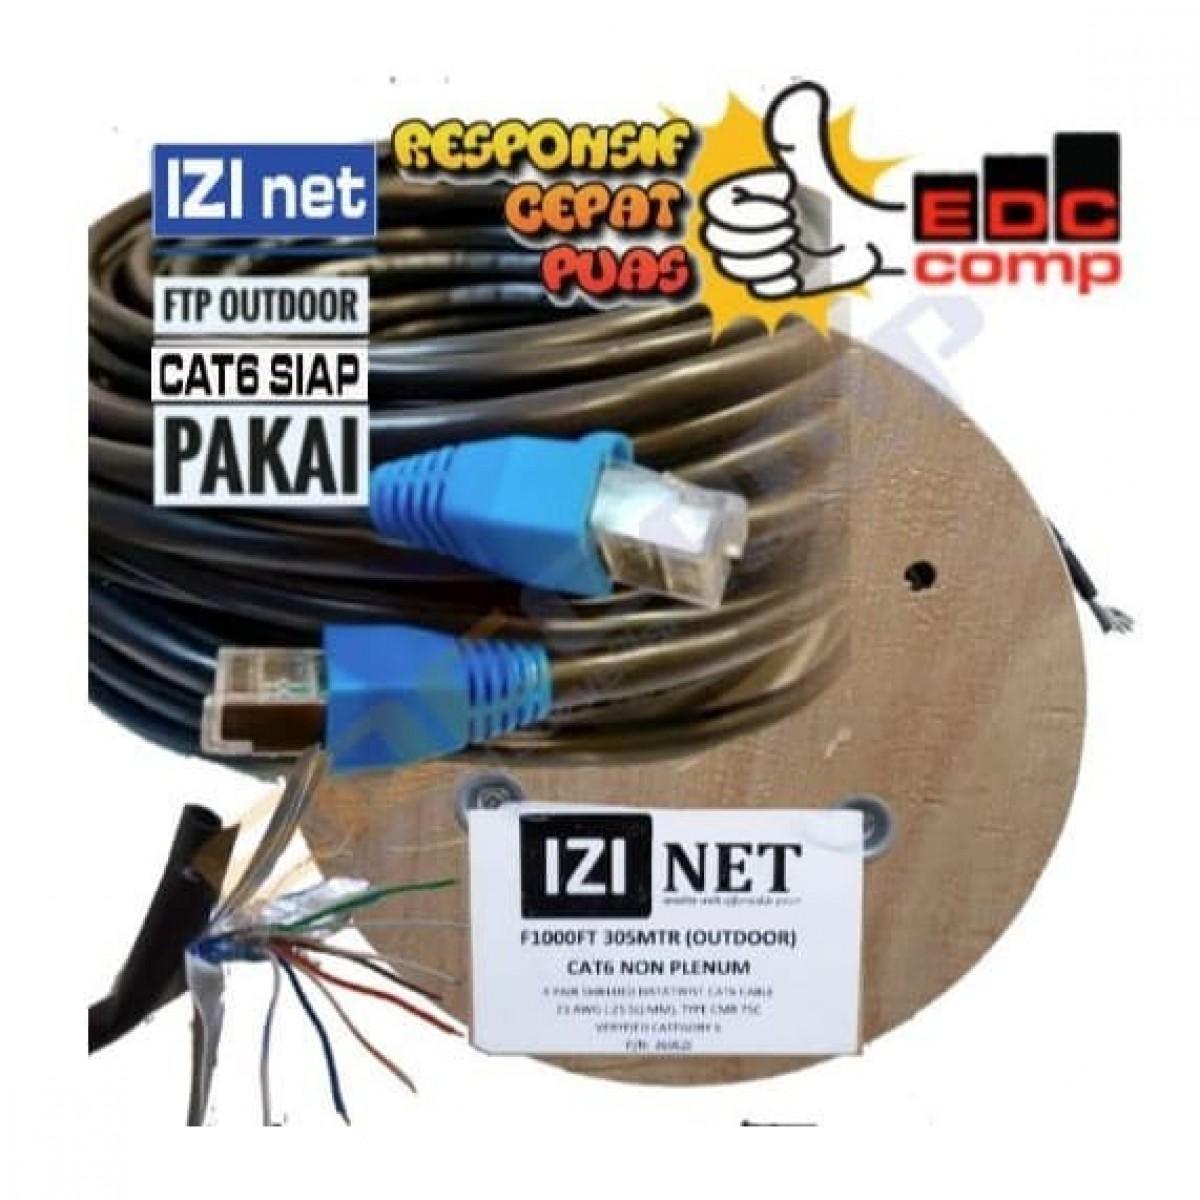 Cable STP/FTP Cat 6 Outdoor Cable 100 Meter IZI net Original - EdcComp